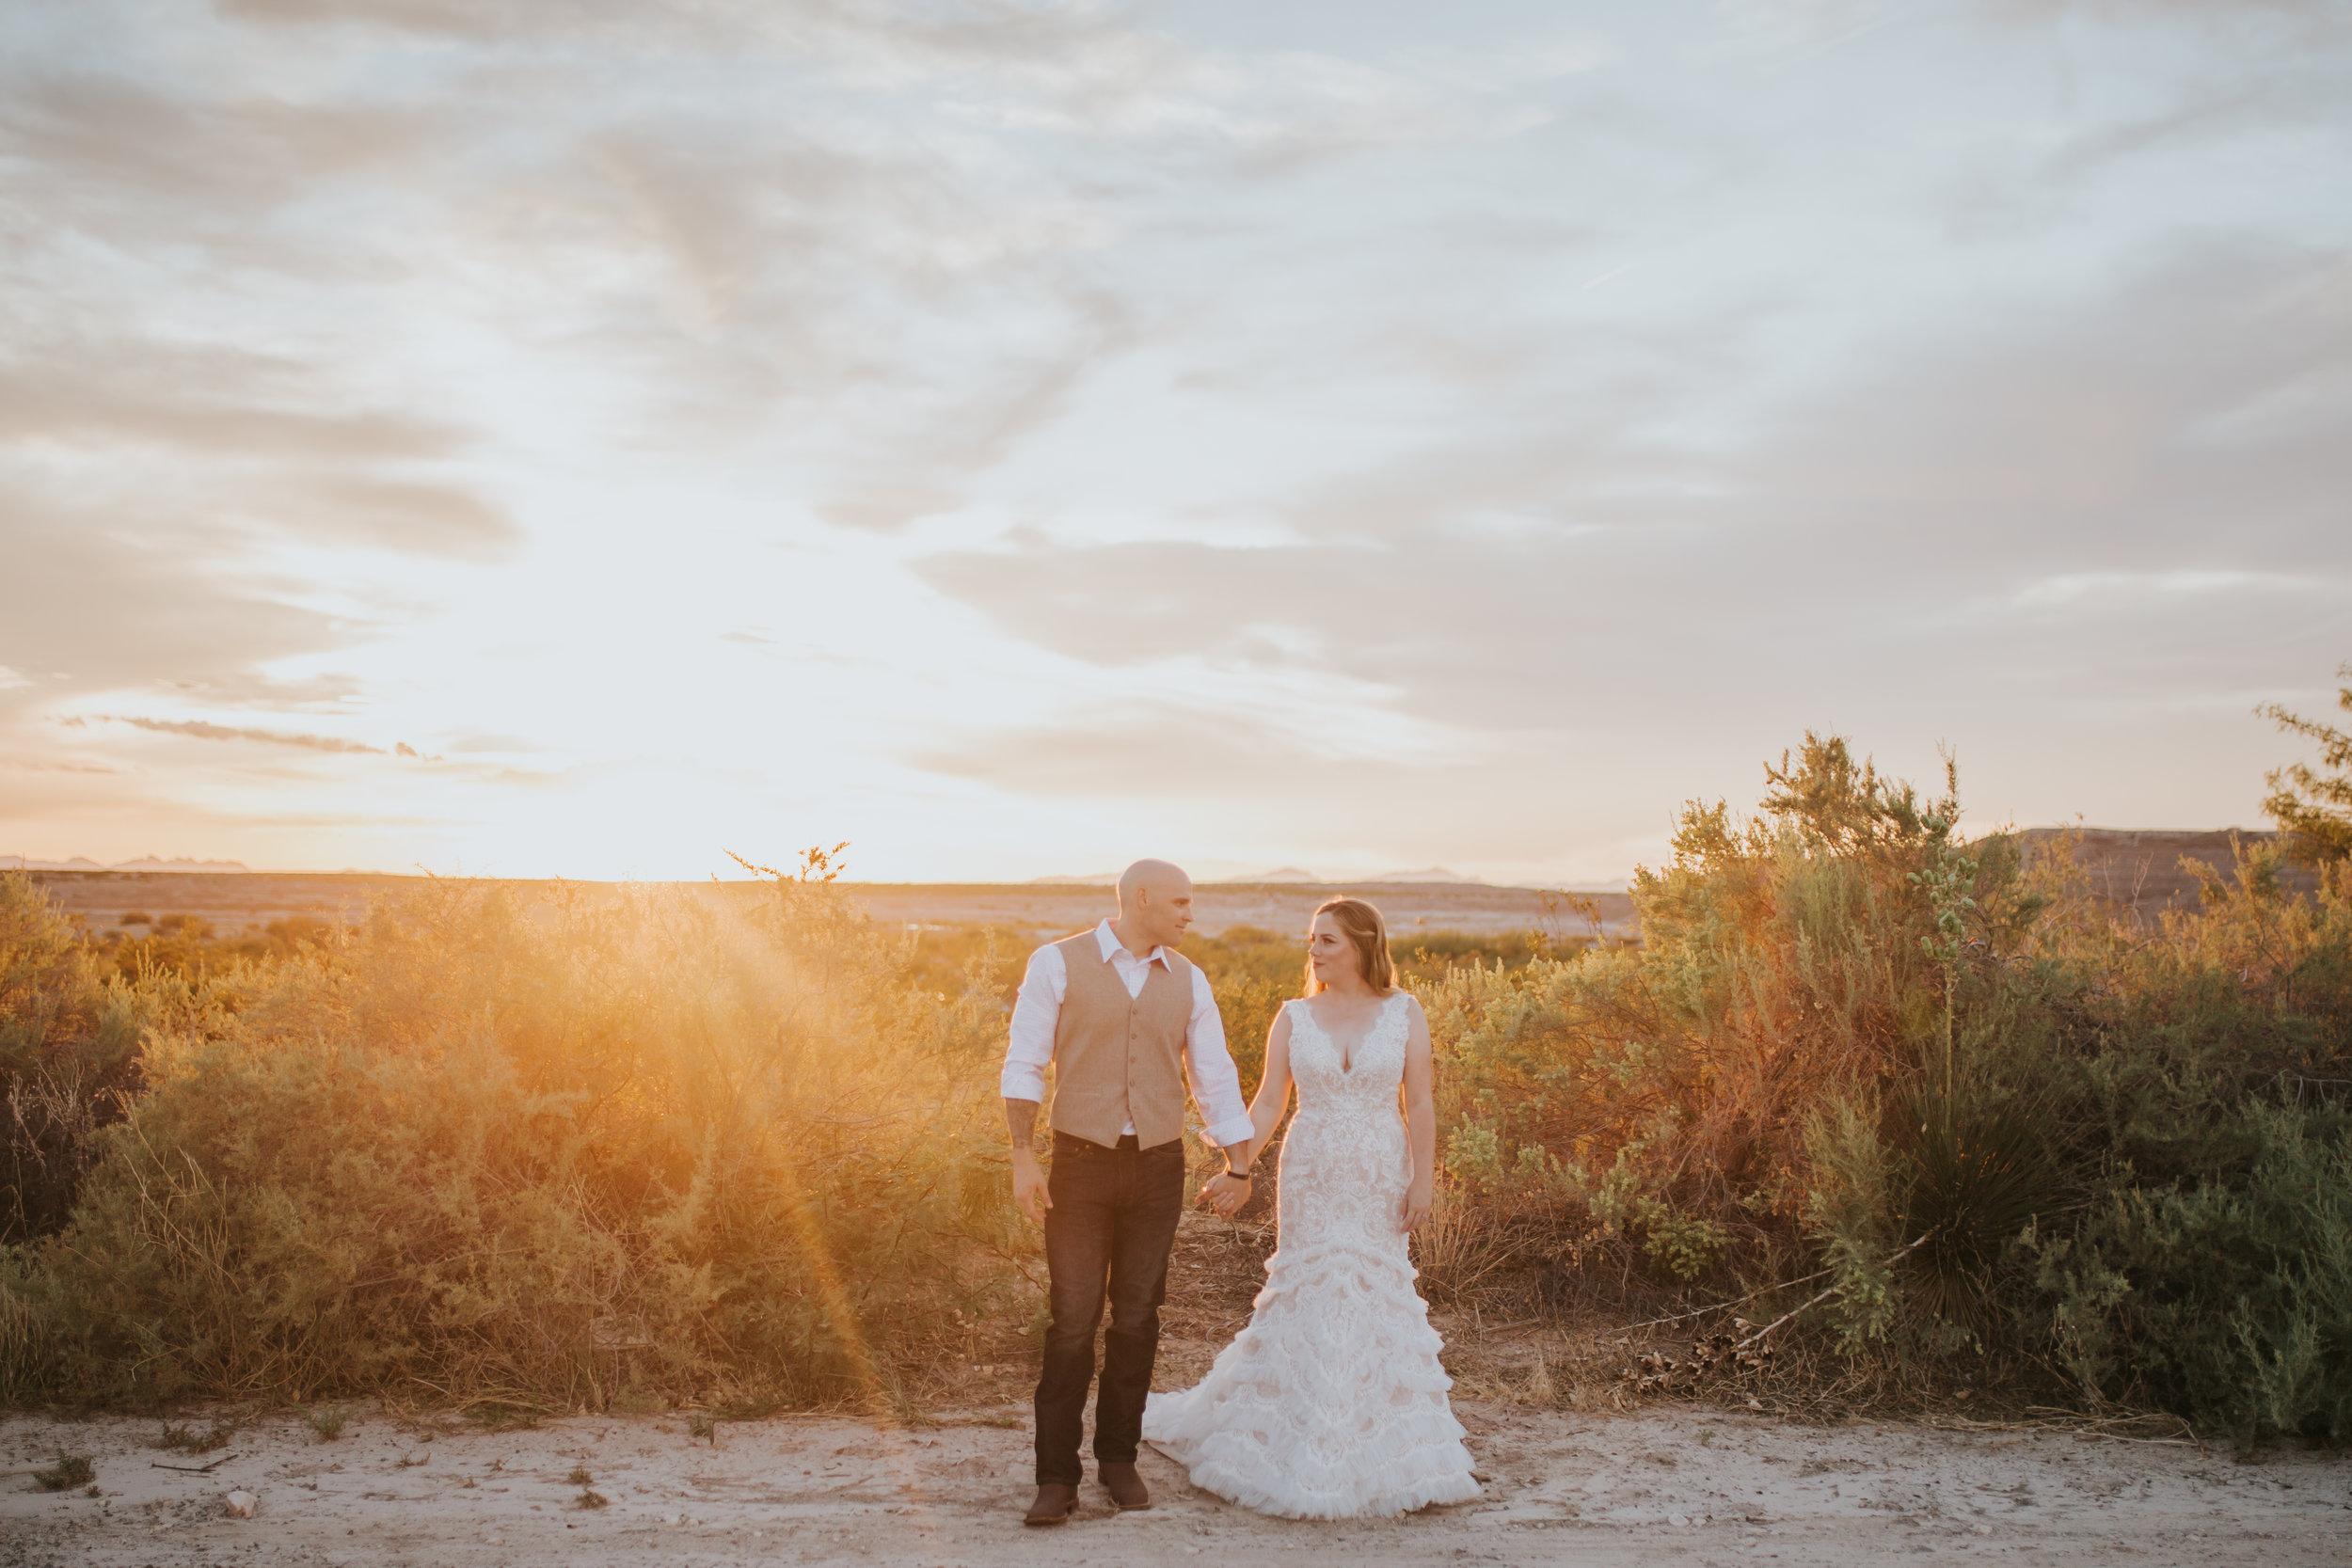 william-taylor-fabens-texas-wedding-50